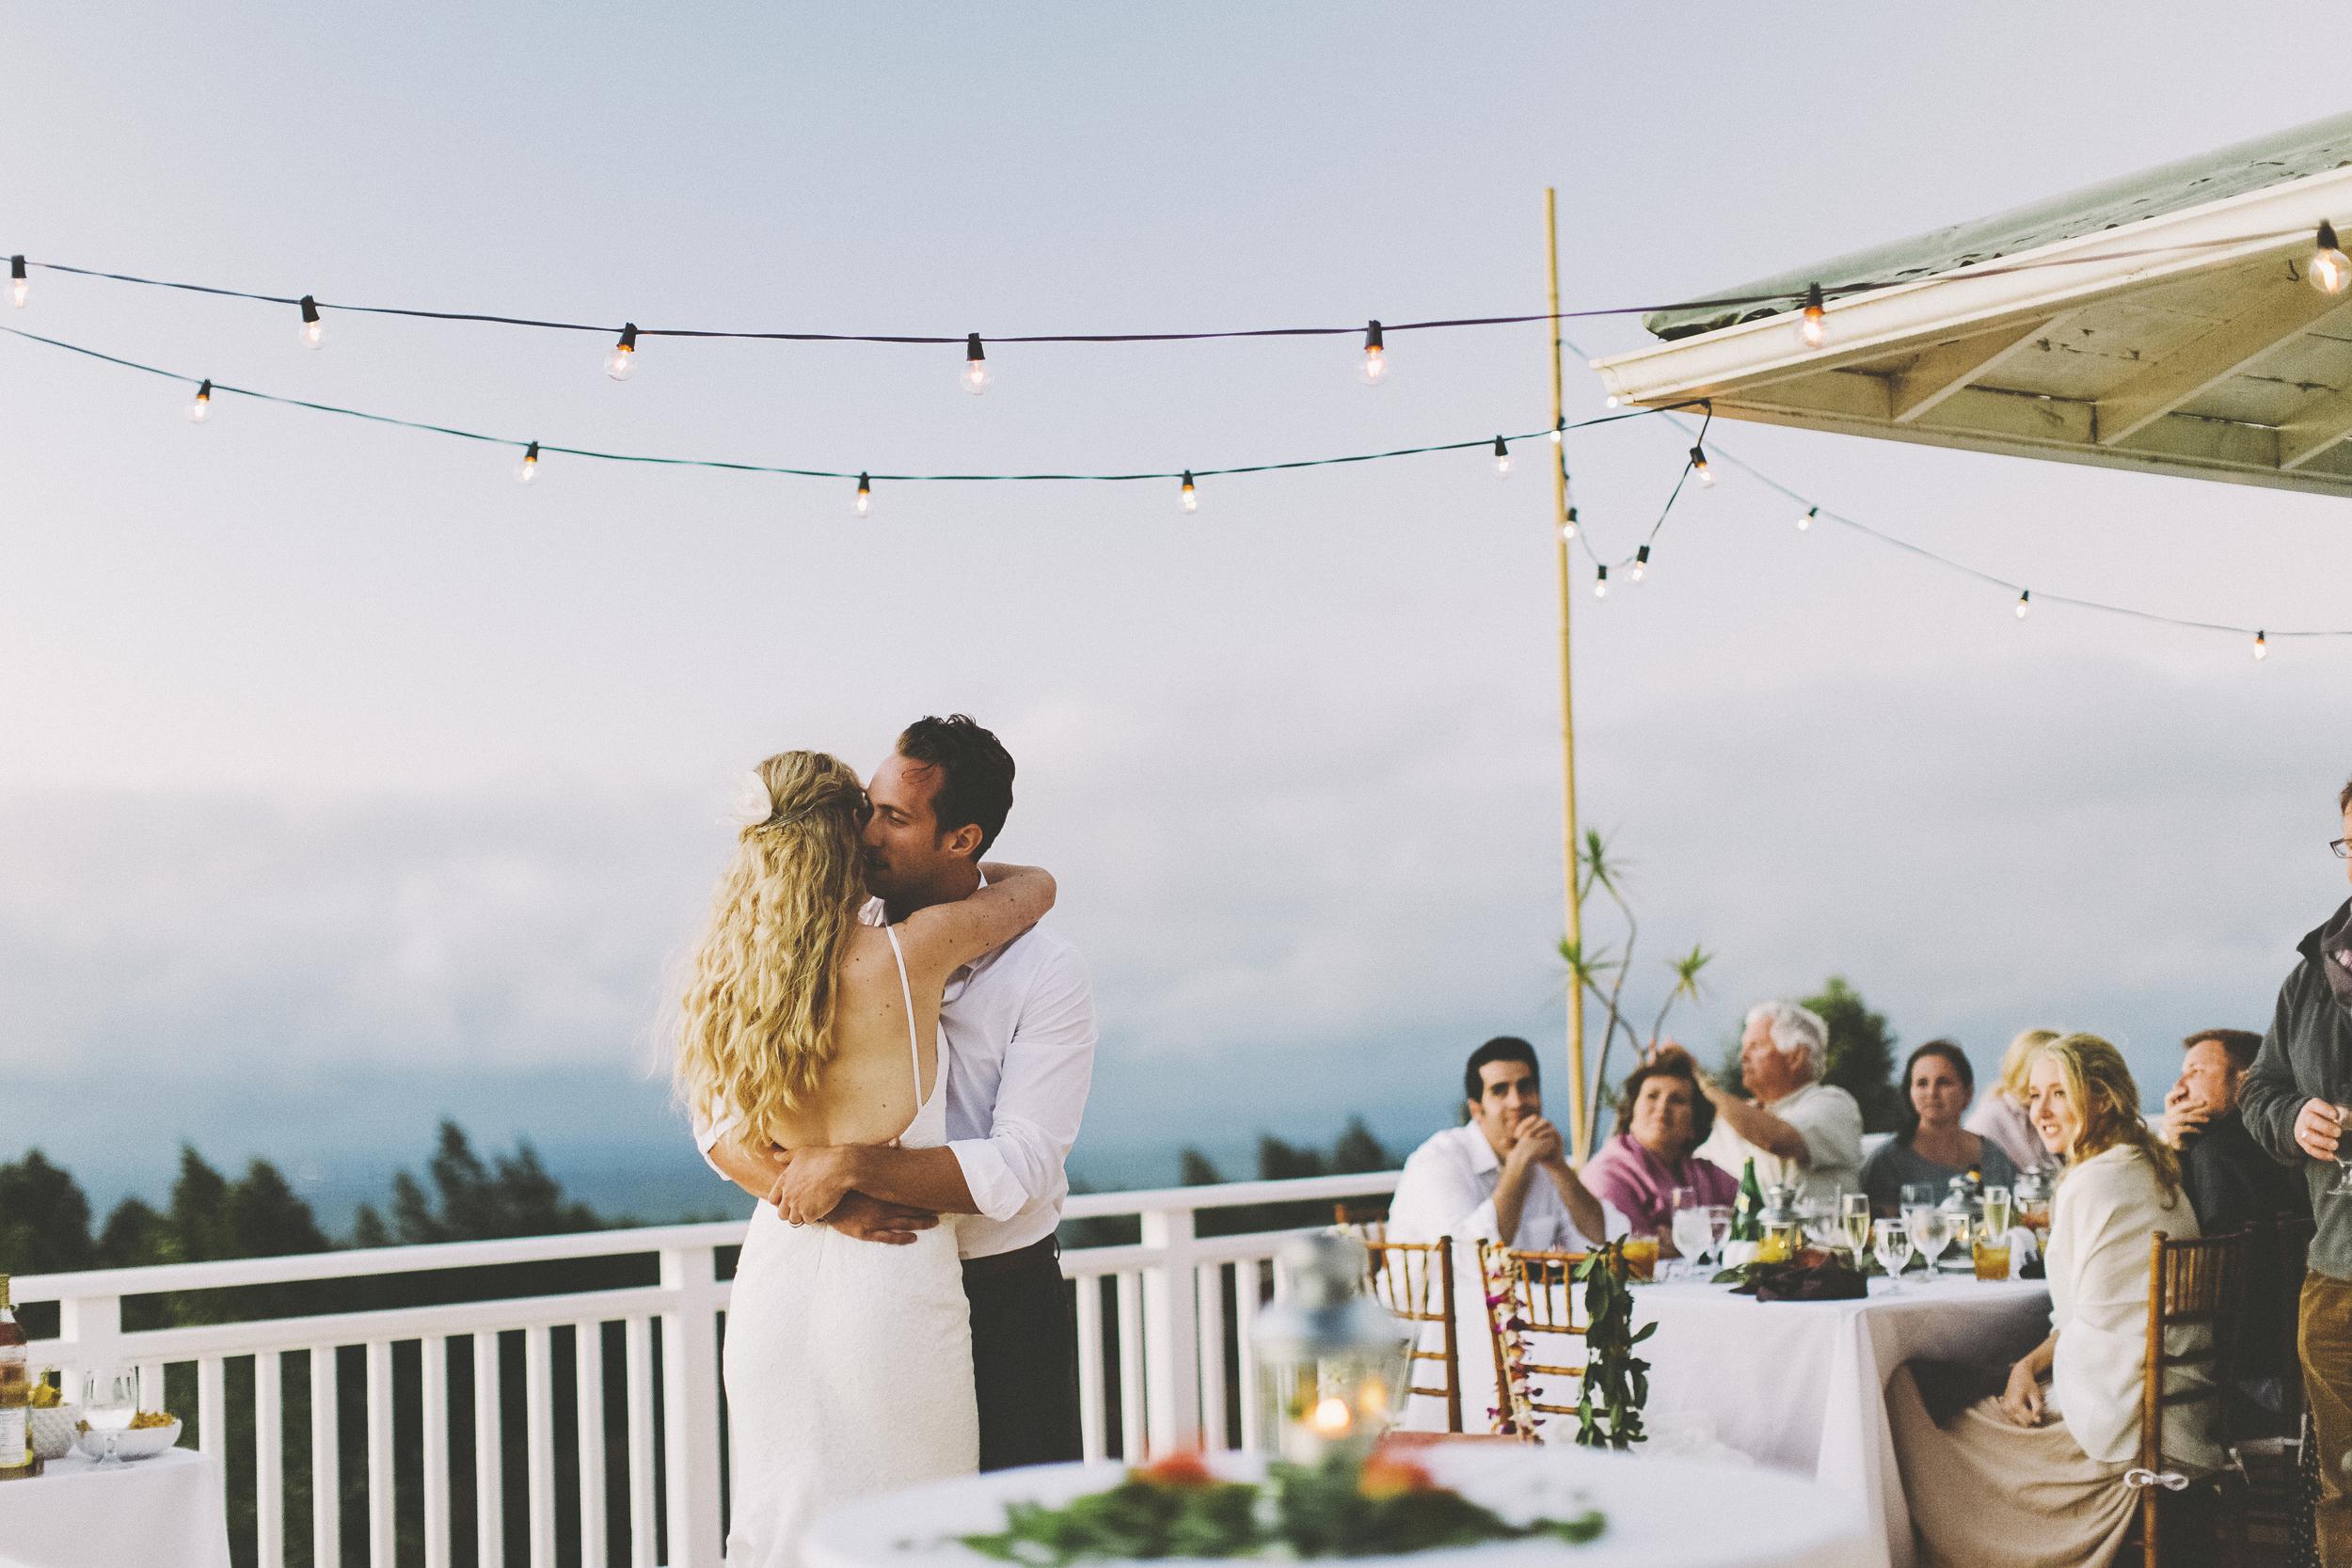 angie-diaz-photography-maui-wedding-116.jpg